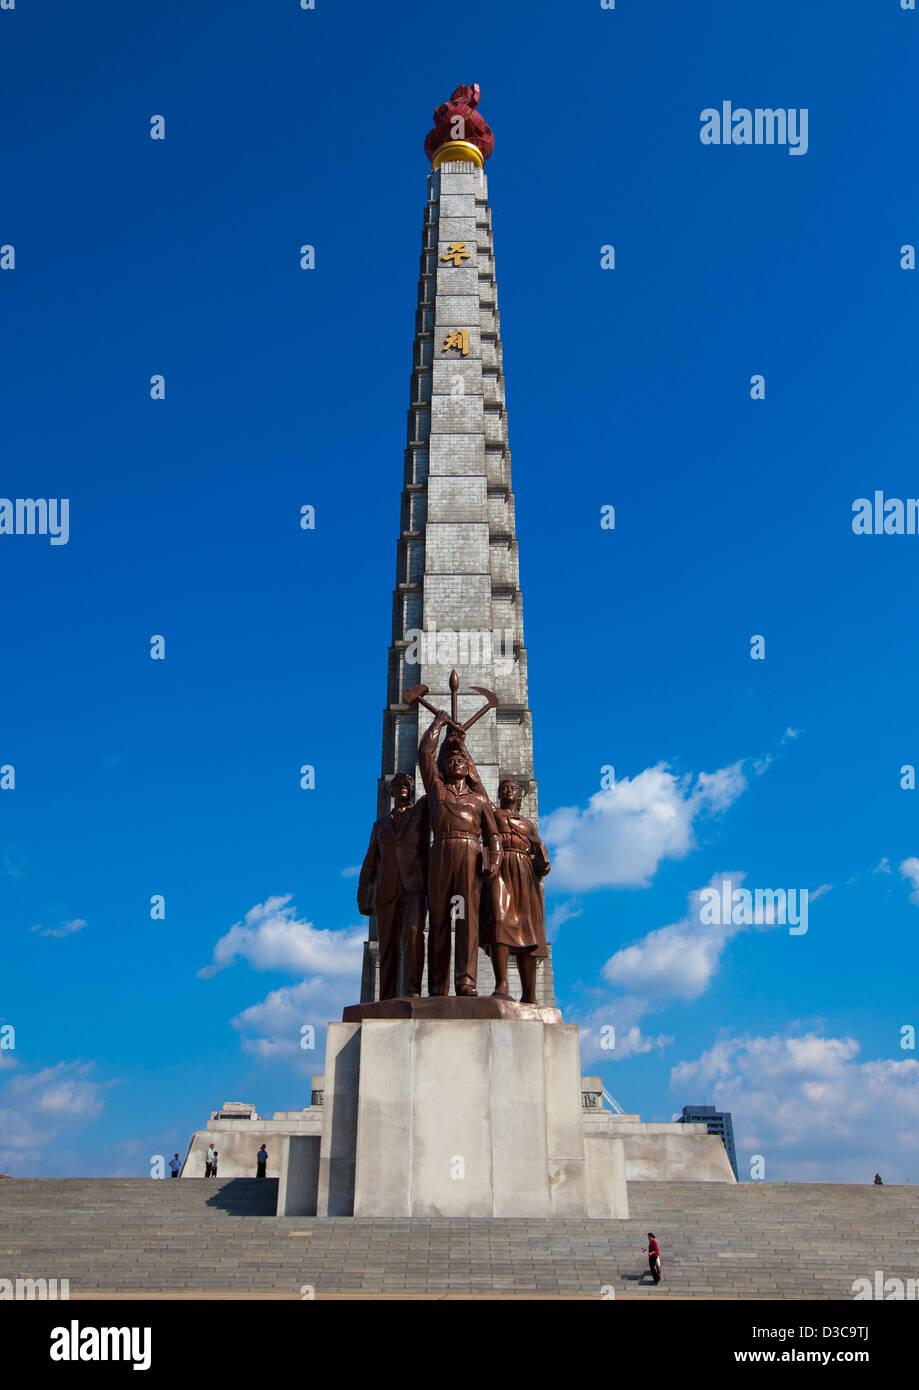 Juche Tower, Pyongyang, North Korea - Stock Image